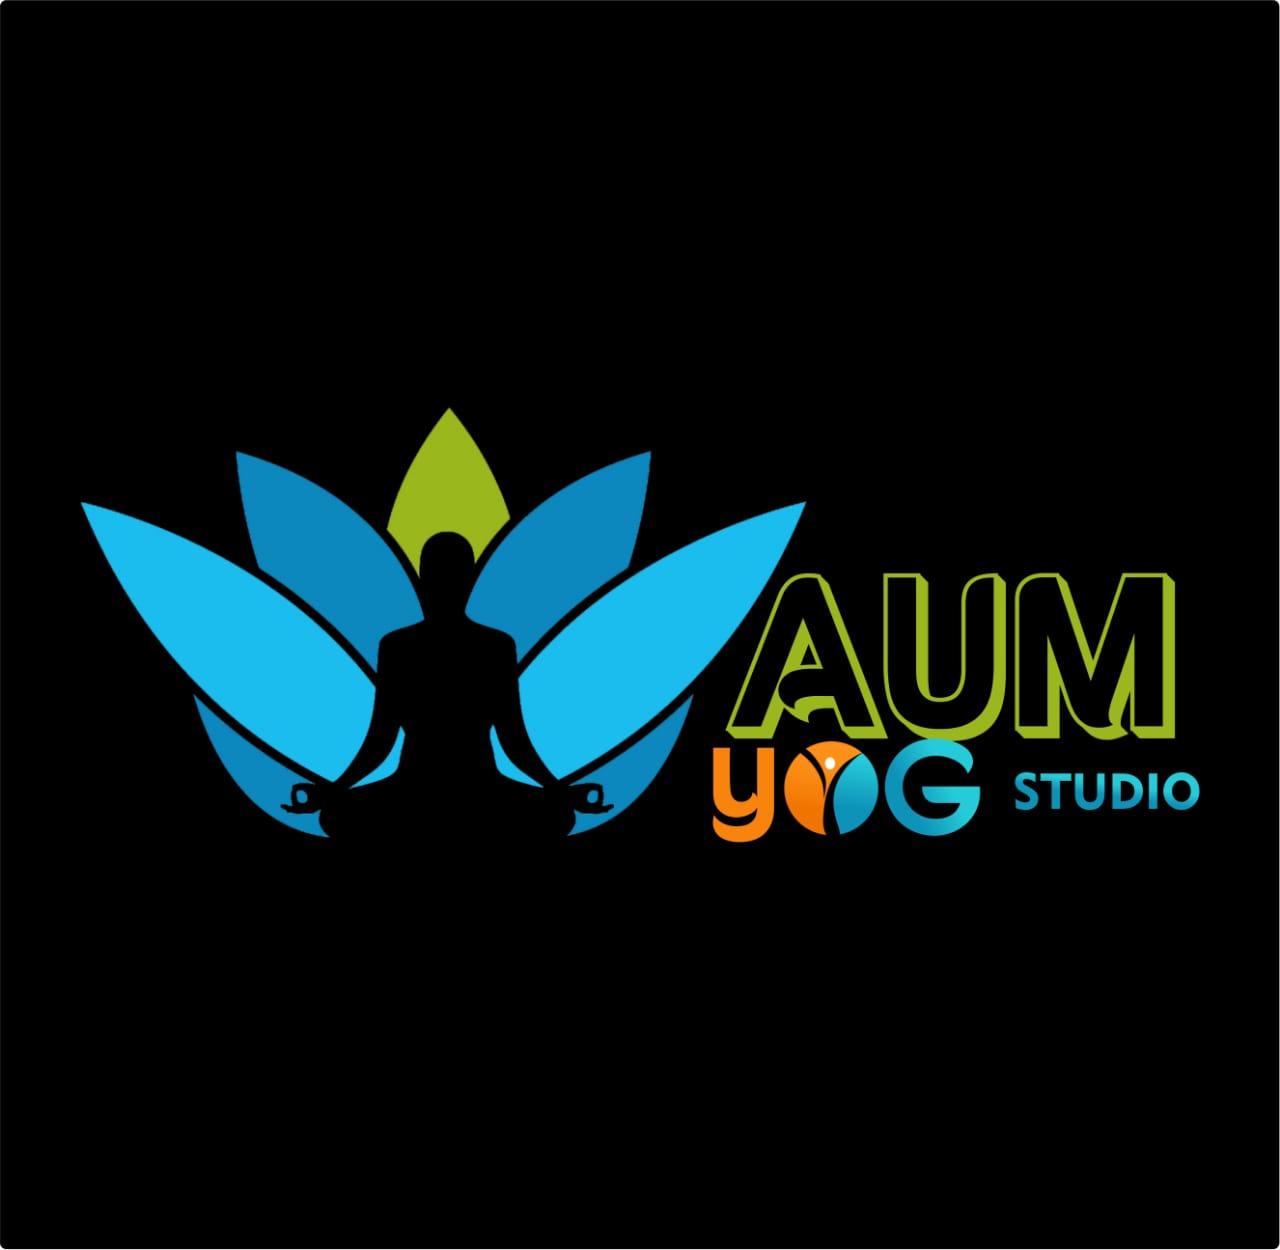 Aum Yog Studio